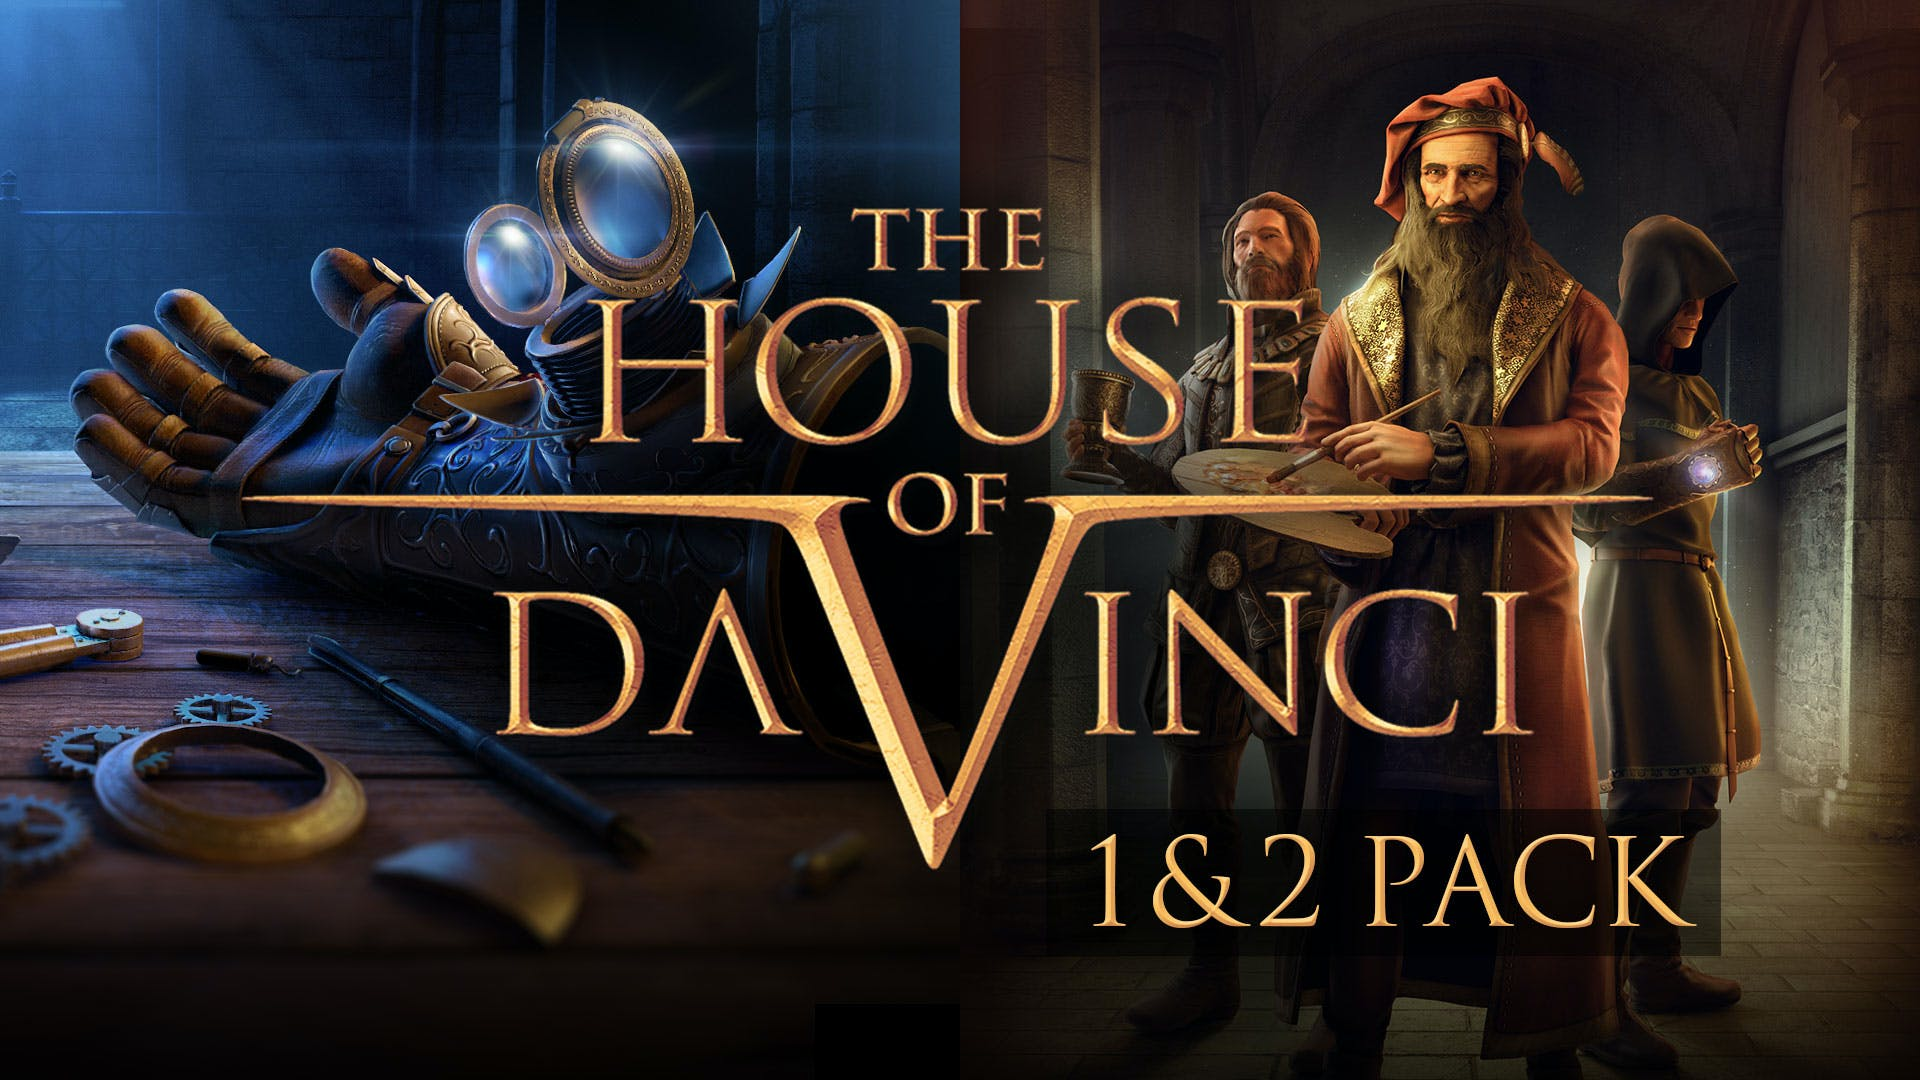 The House of Da Vinci 1 + 2 Pack